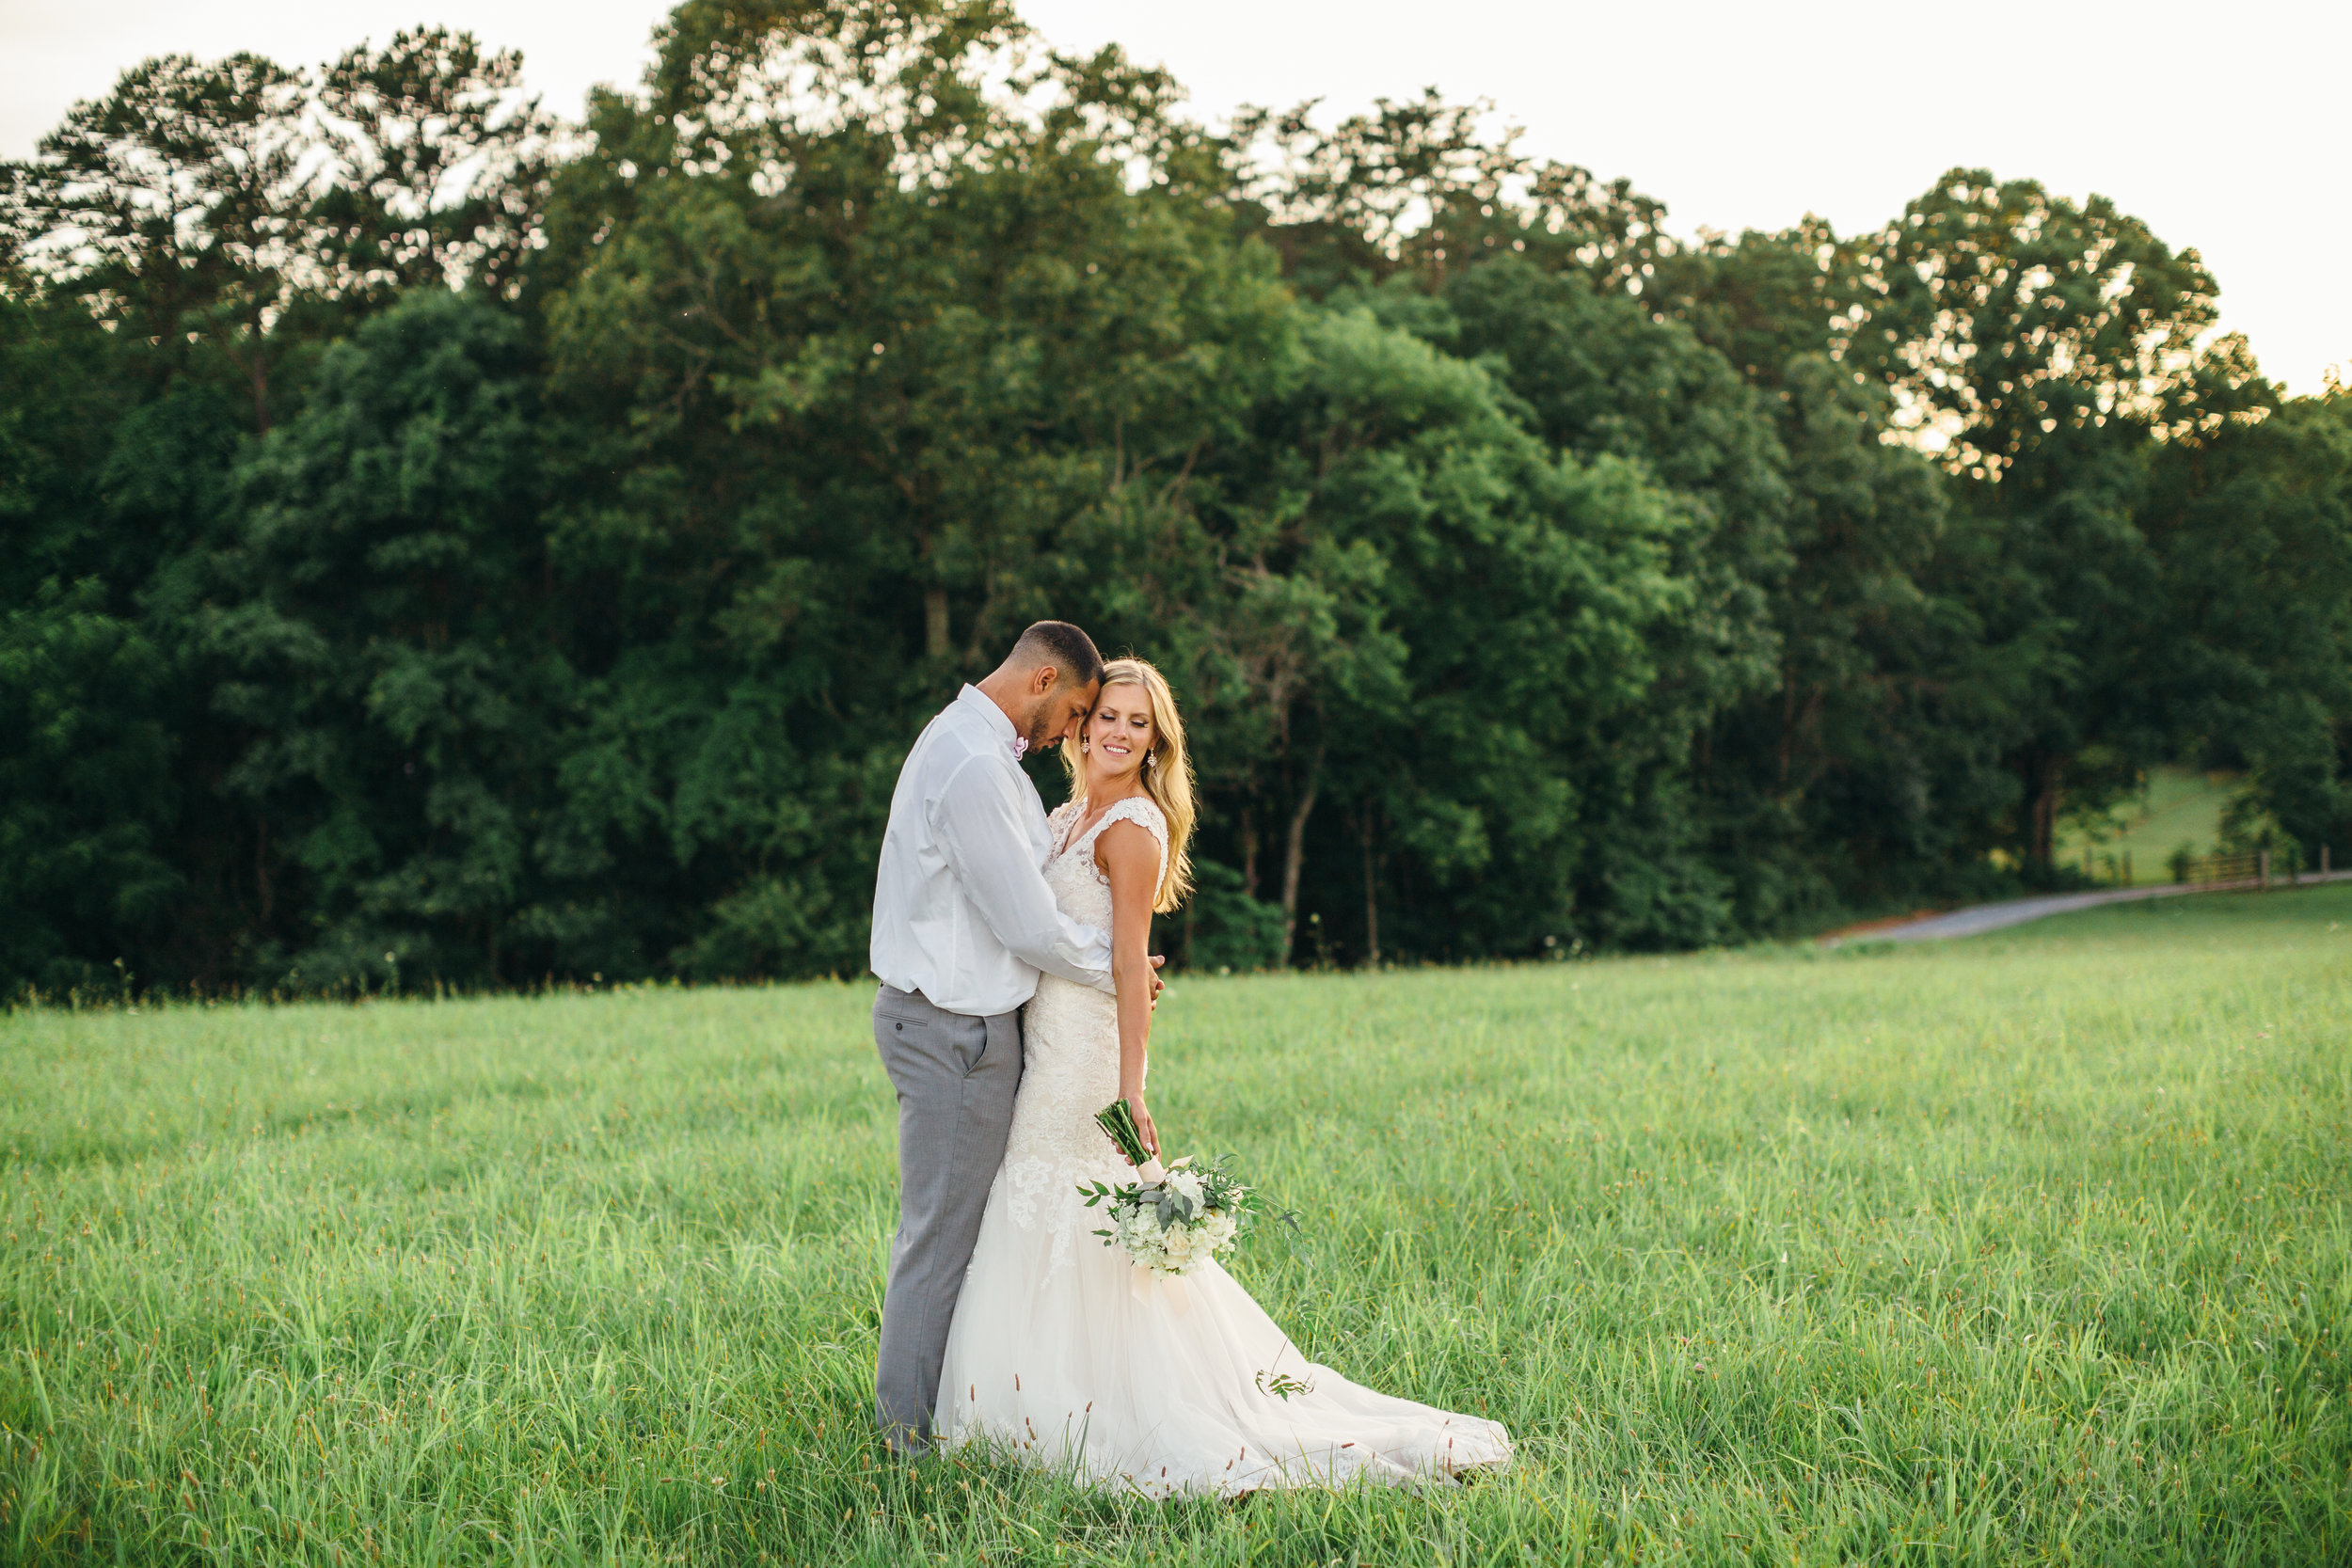 Lynchburg Wedding Photographer; Lynchburg Photographer; Lynchburg Wedding; Sorella Farms Wedding; Virginia Wedding Photographer; Virginia Wedding-25.jpg